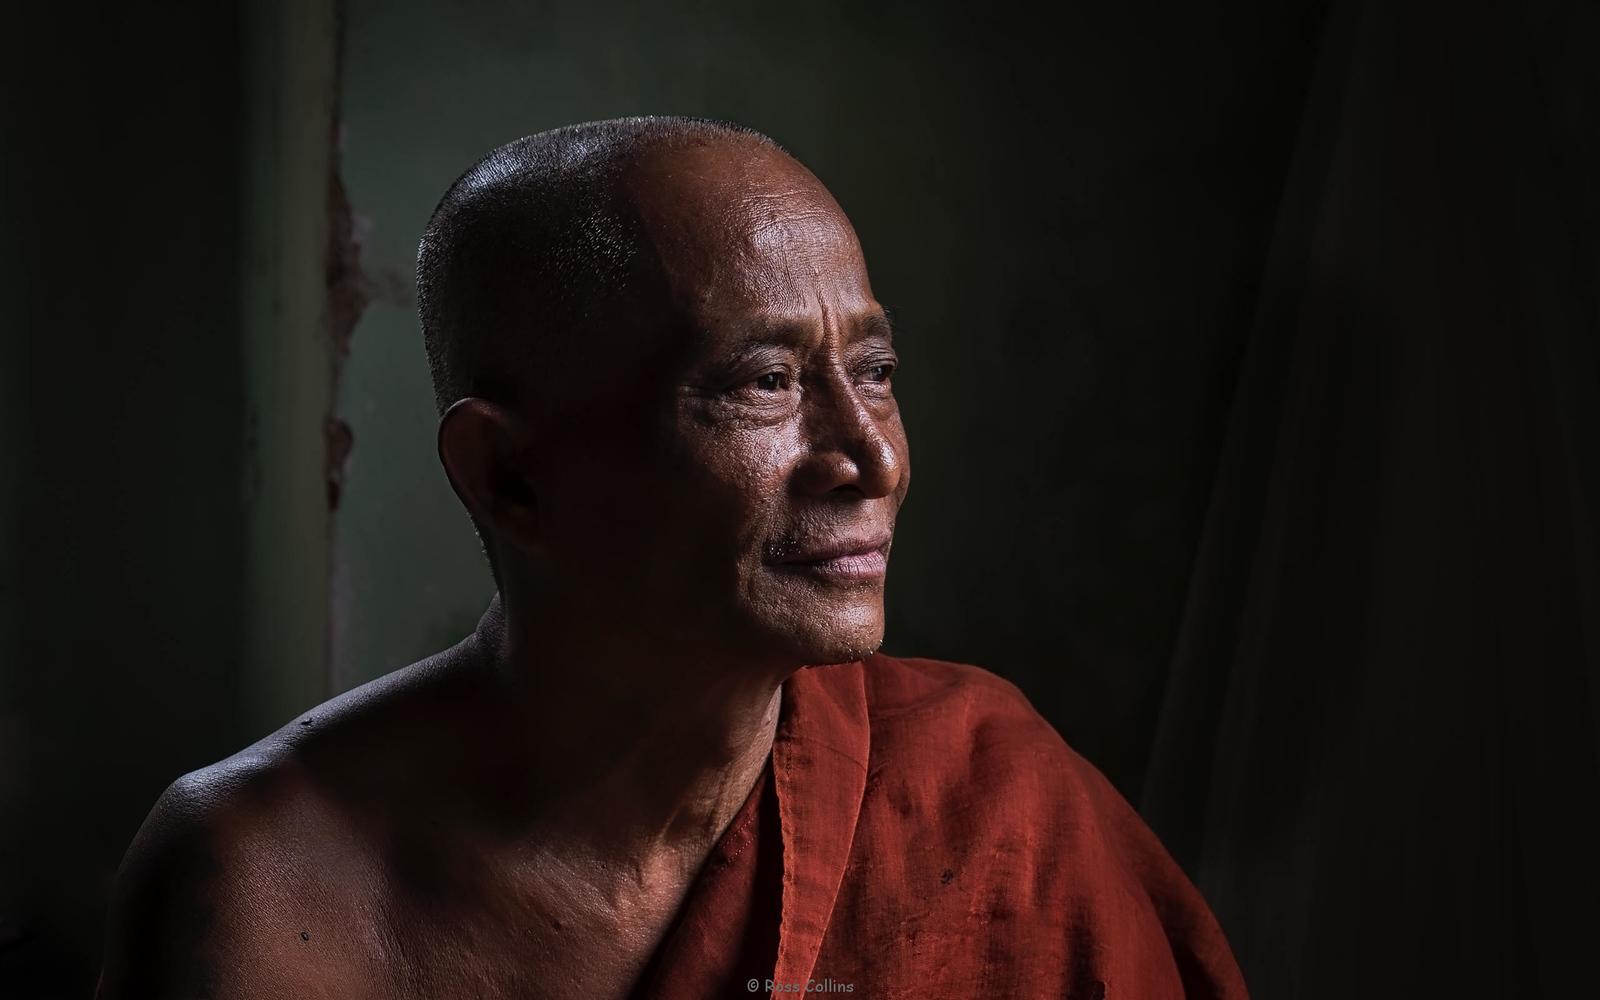 U Damma Won Tha, Chief Monk at the monestary attached to the Mya Sayti Pagoda in Dawei